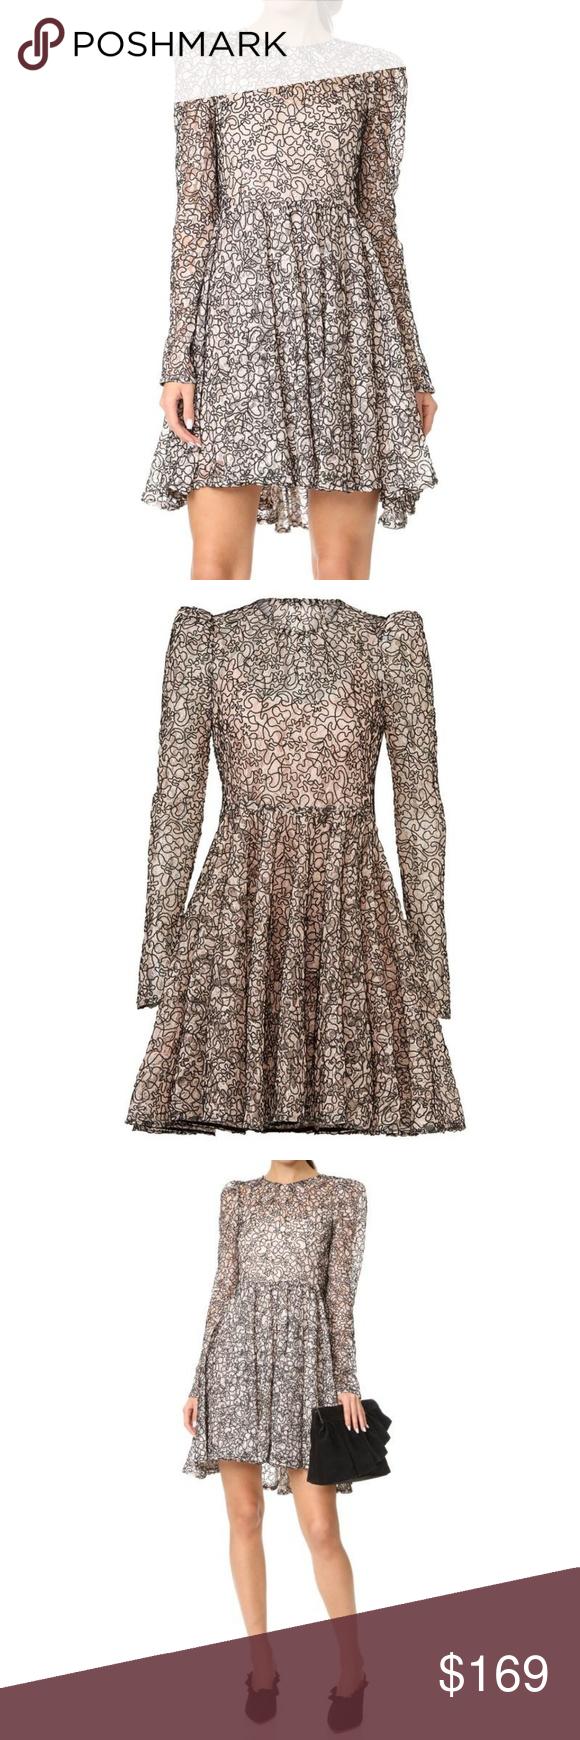 Womens Clothing Milly Blushblack Aria Dress Dresses Clothing